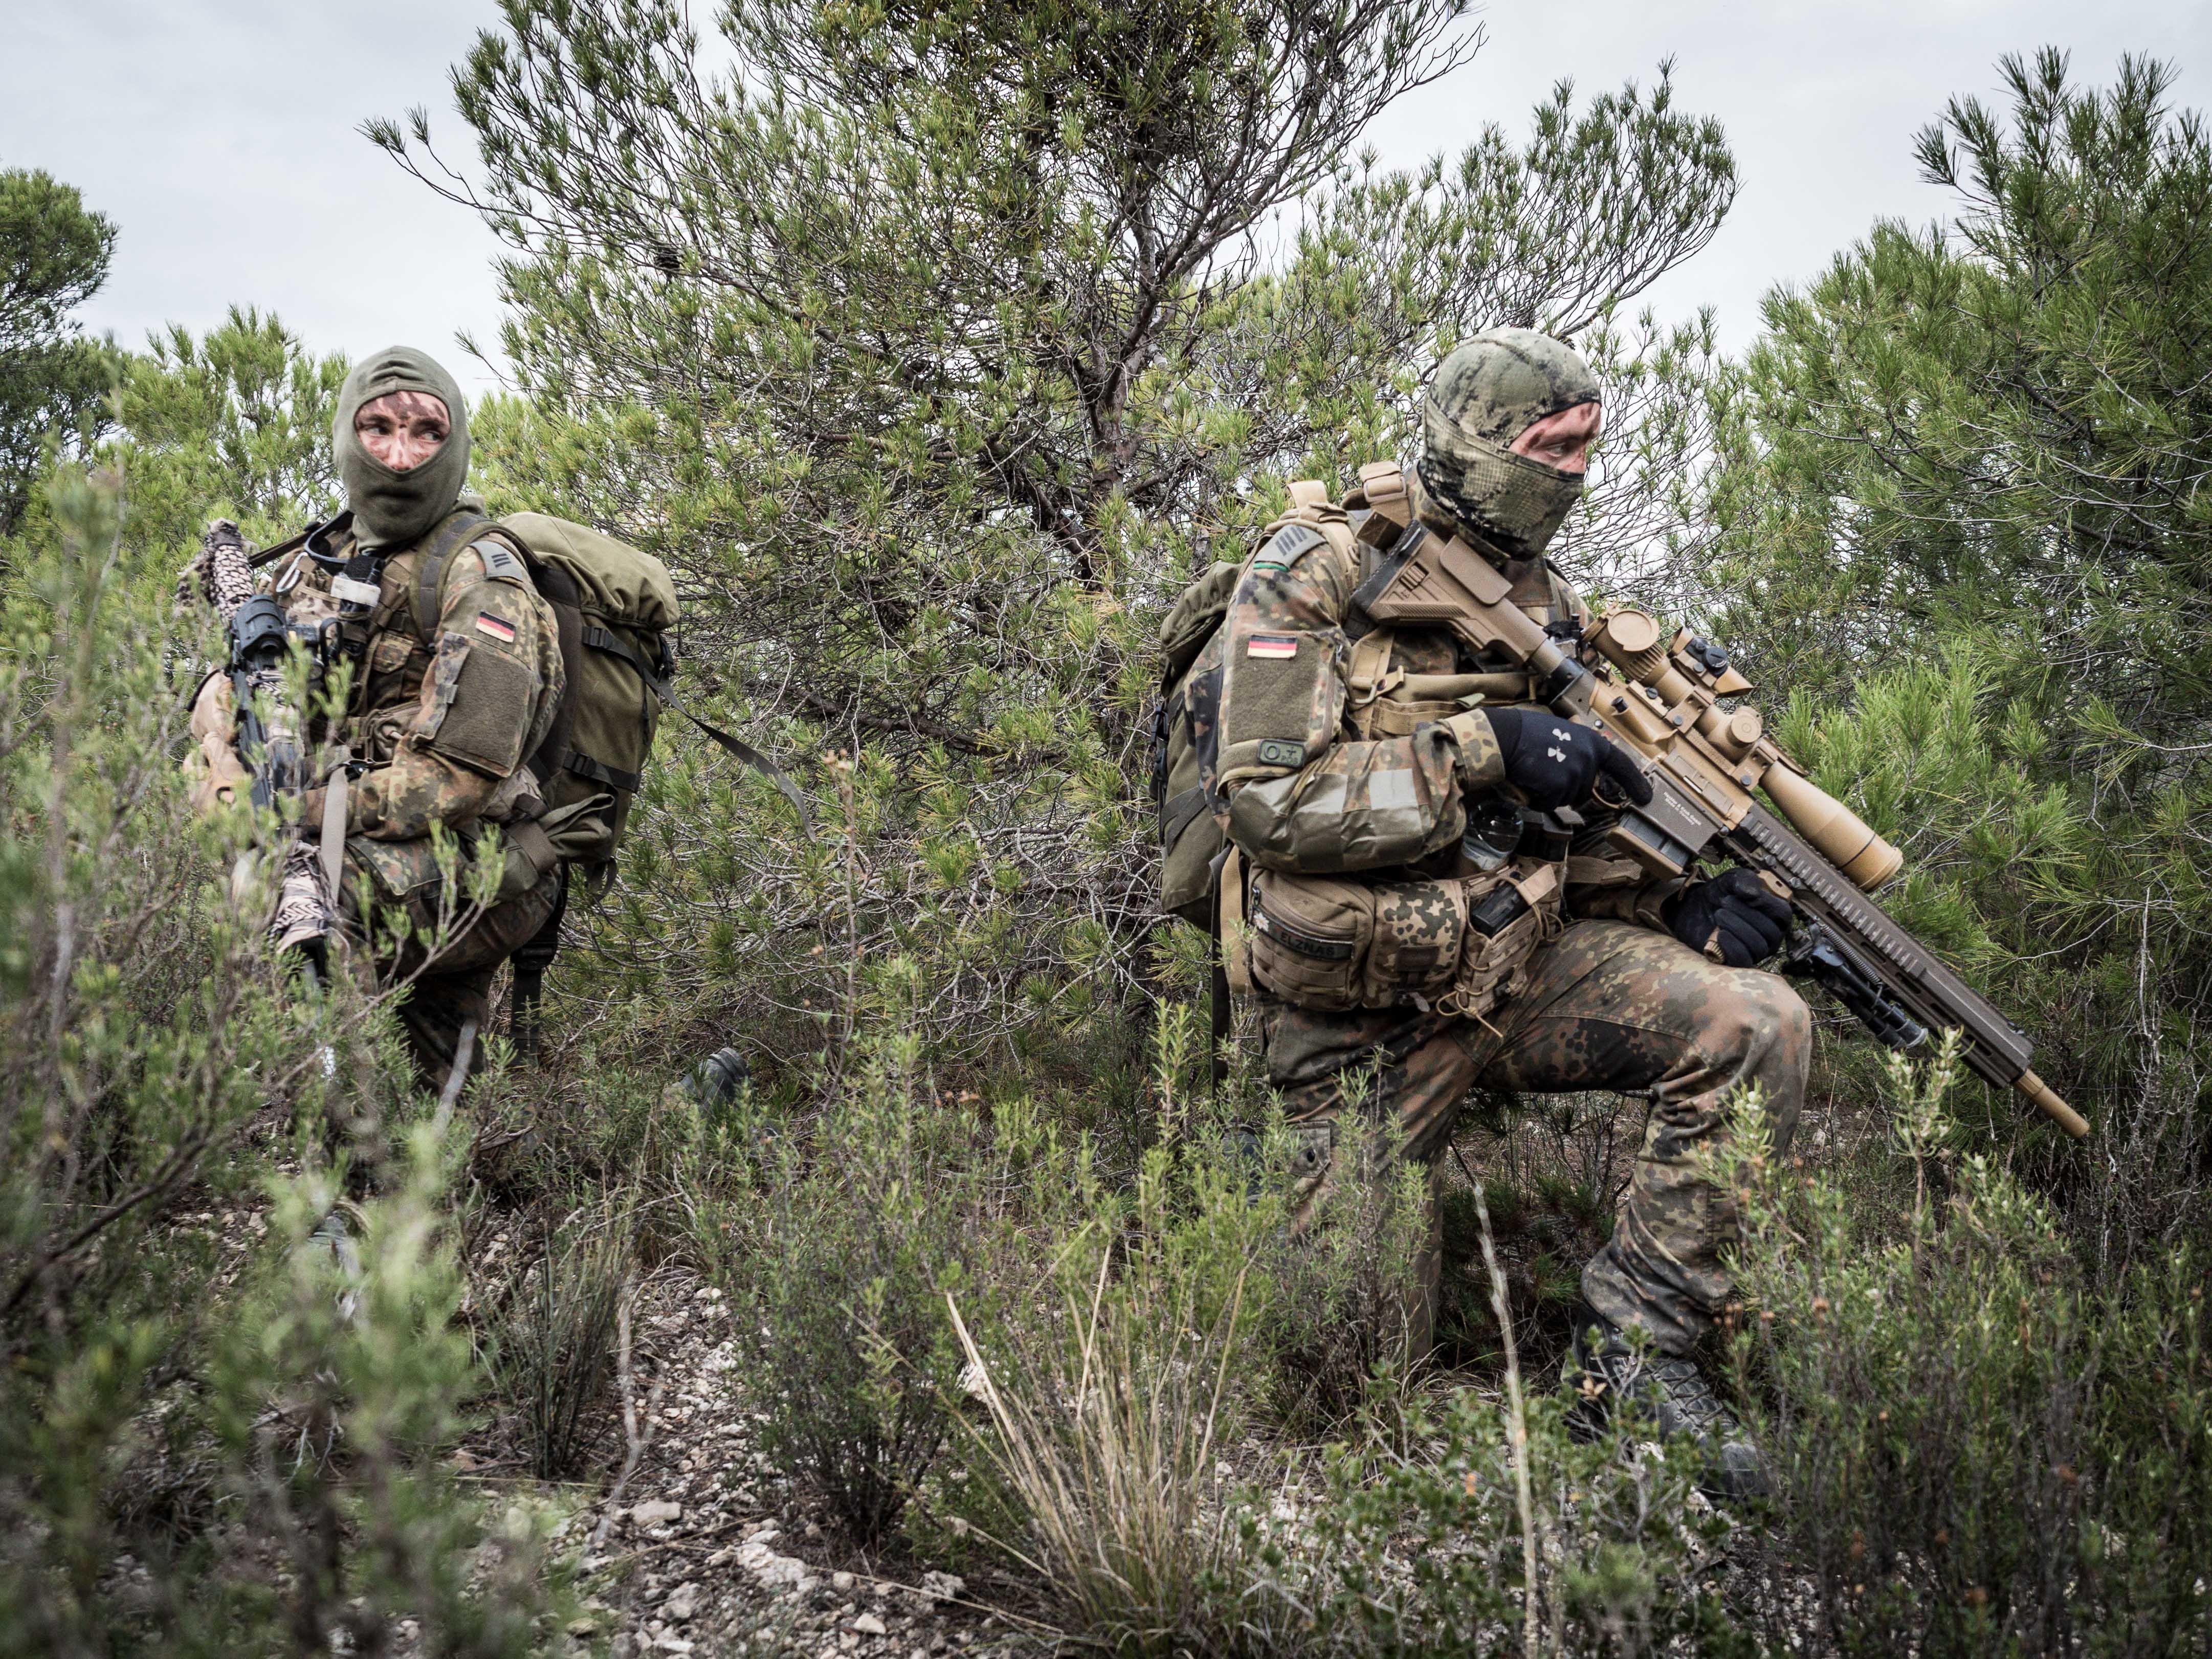 FileDEU Mountain Infantry San Gregorio Spain Trident